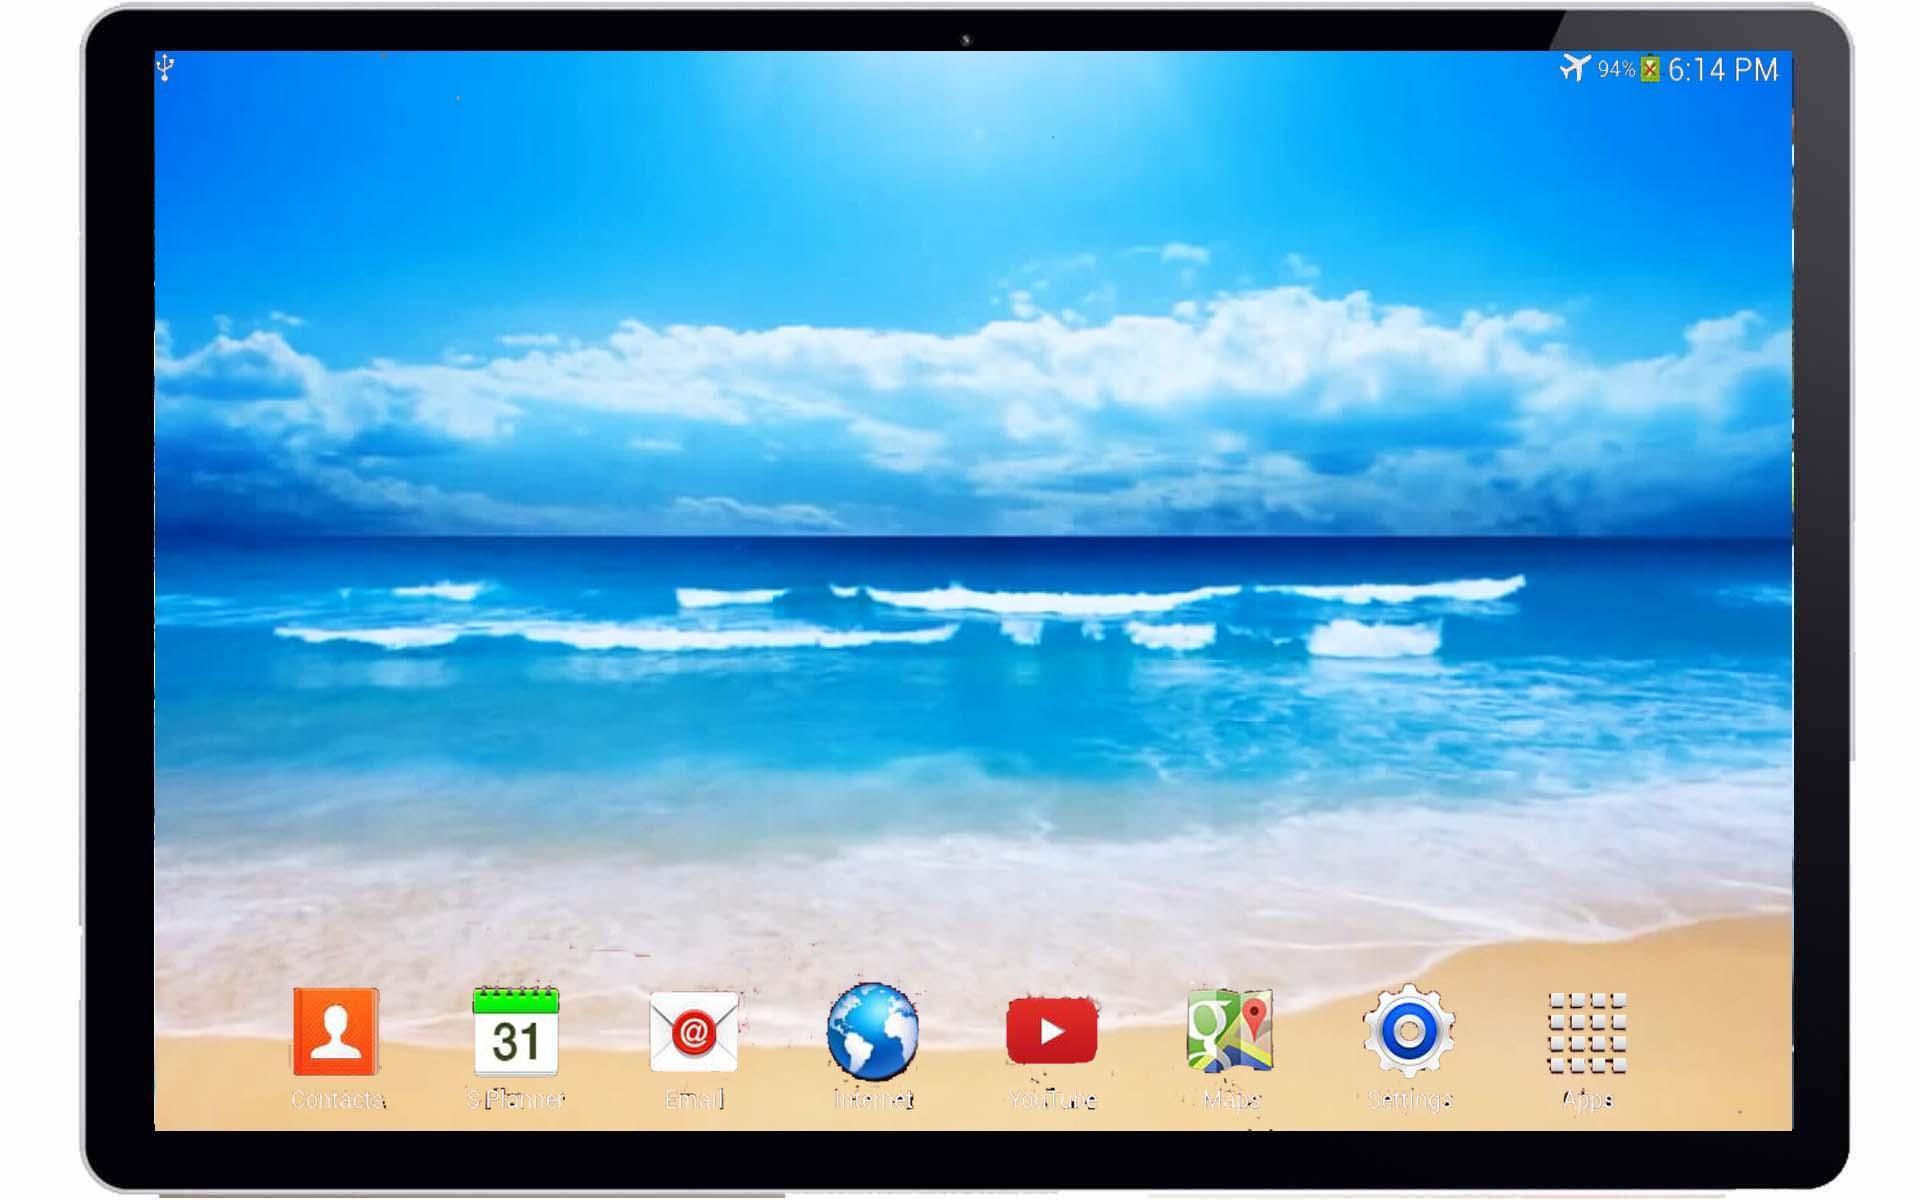 Download 6100 Wallpaper Iphone Pantai Gambar Paling Keren